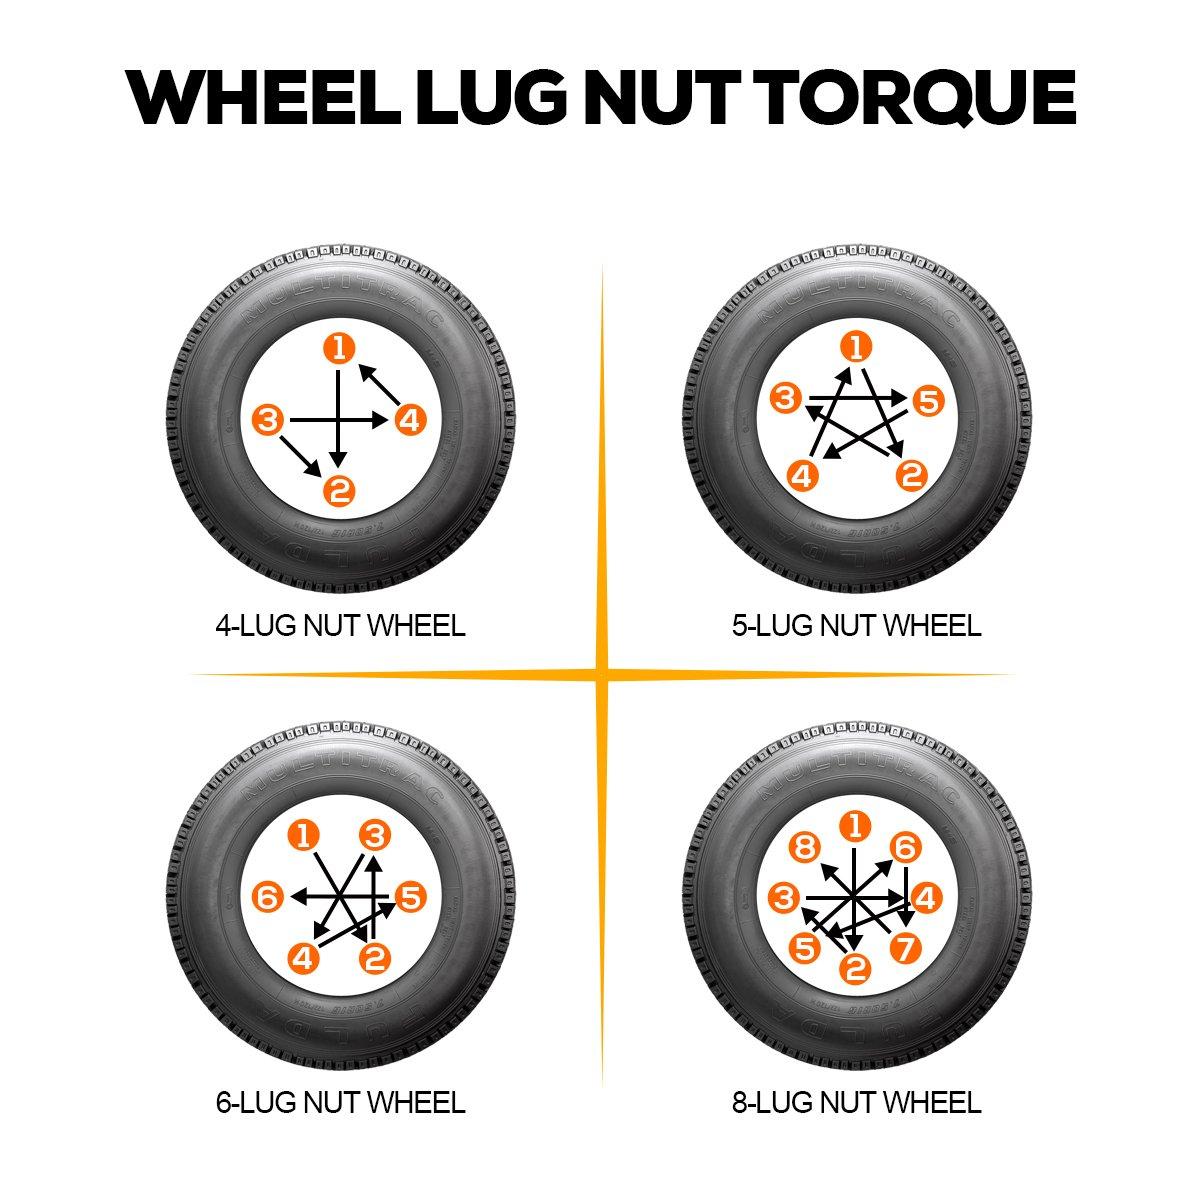 6x5.5 Wheel Spacers for Toyota 4Runner Tacoma Tundra FJ Cruiser Sequoia Ventury Fortuner Land Cruiser Lexus GX J120 J150 4pcs 6x139.7 106mm 1.25 M12x1.5 Forged Hub Centric Wheels Spacer 6 Lug Rim Fastfree